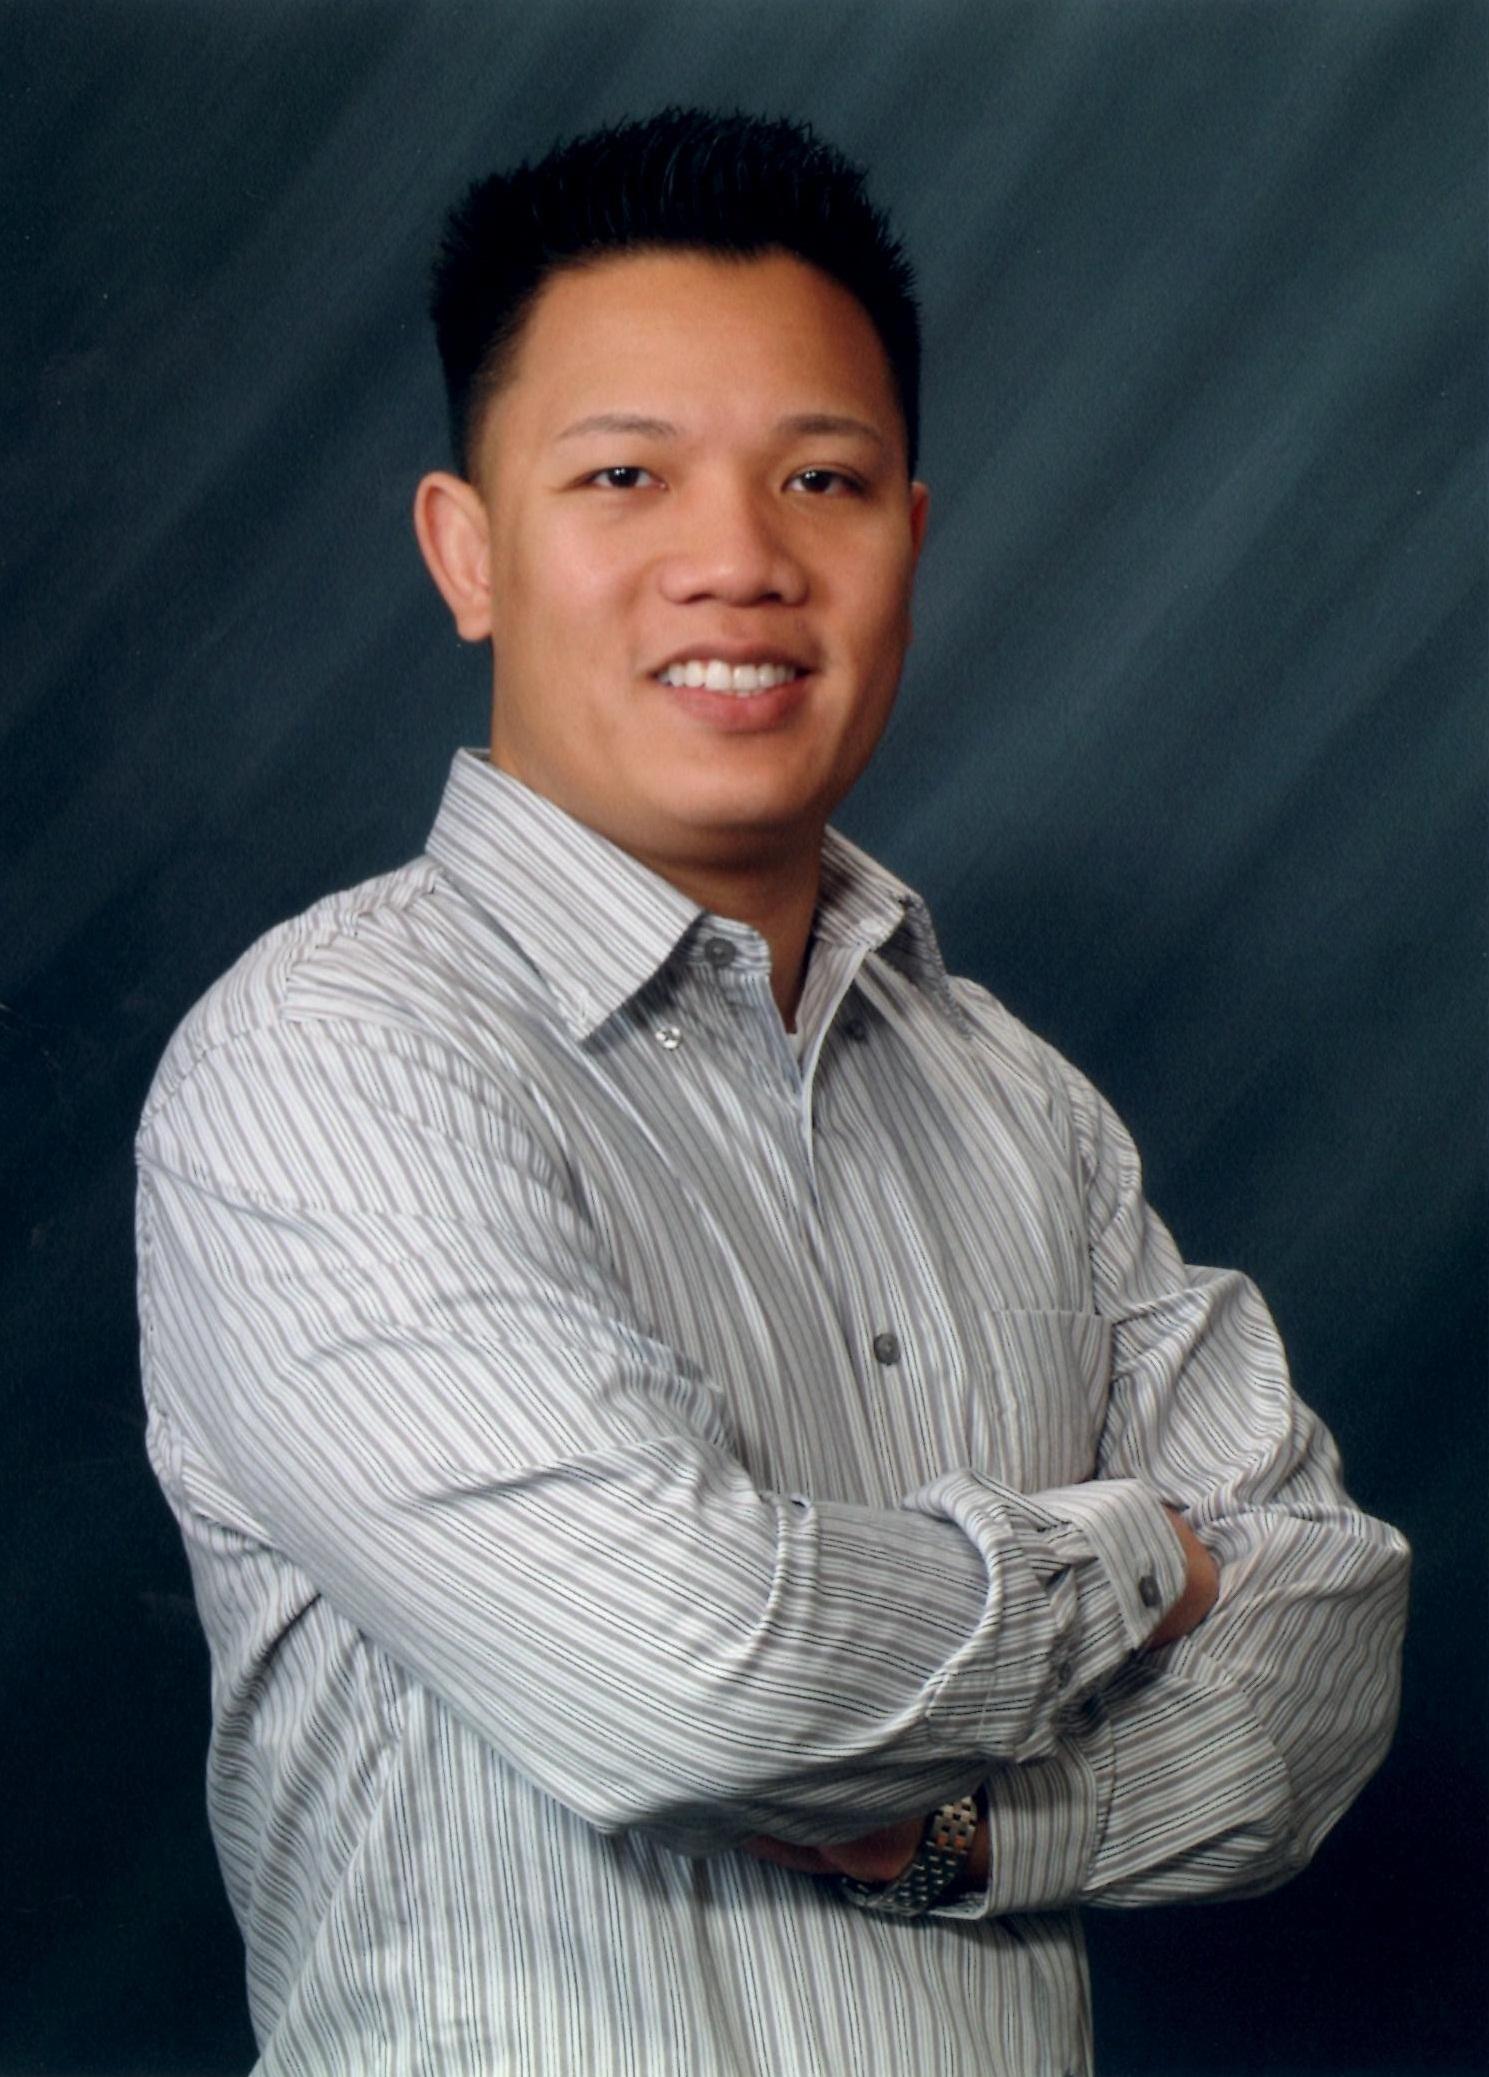 Thanh Nguyen Net Worth